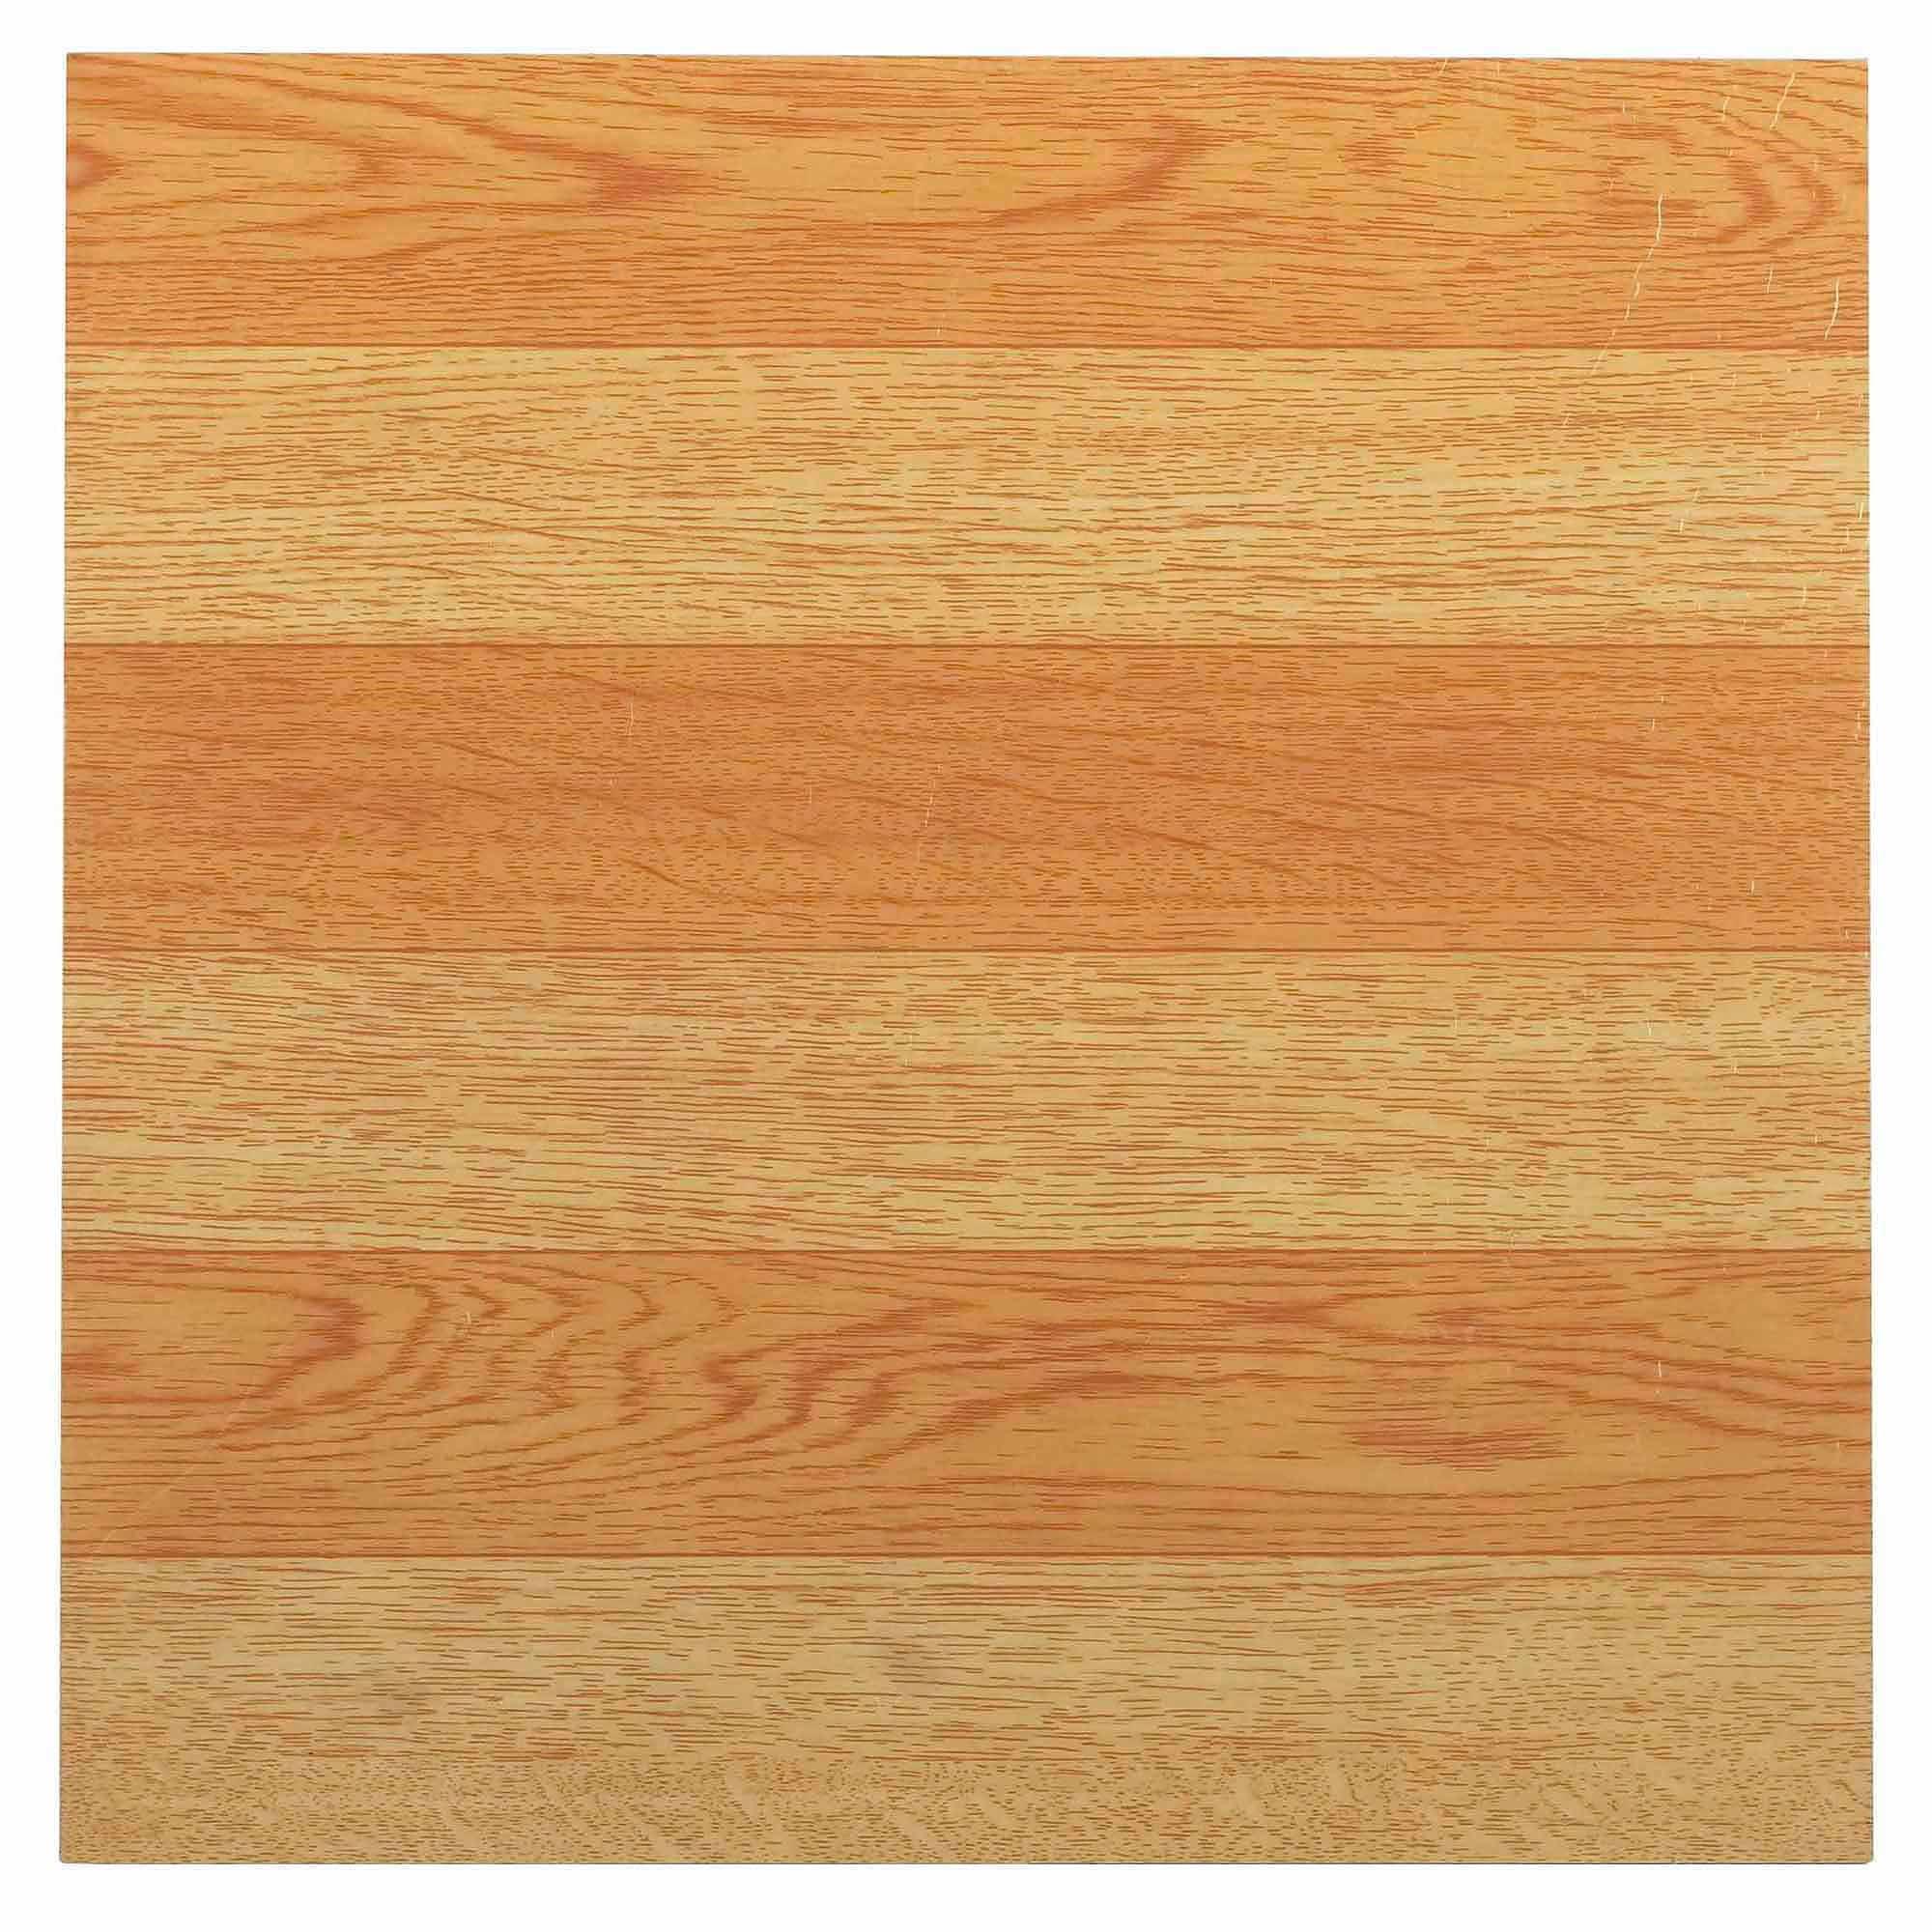 NEXUS Light Oak Plank-Look 12x12 Inch Self Adhesive Vinyl Floor Tile - 20 Tiles/20 Sq.Ft.